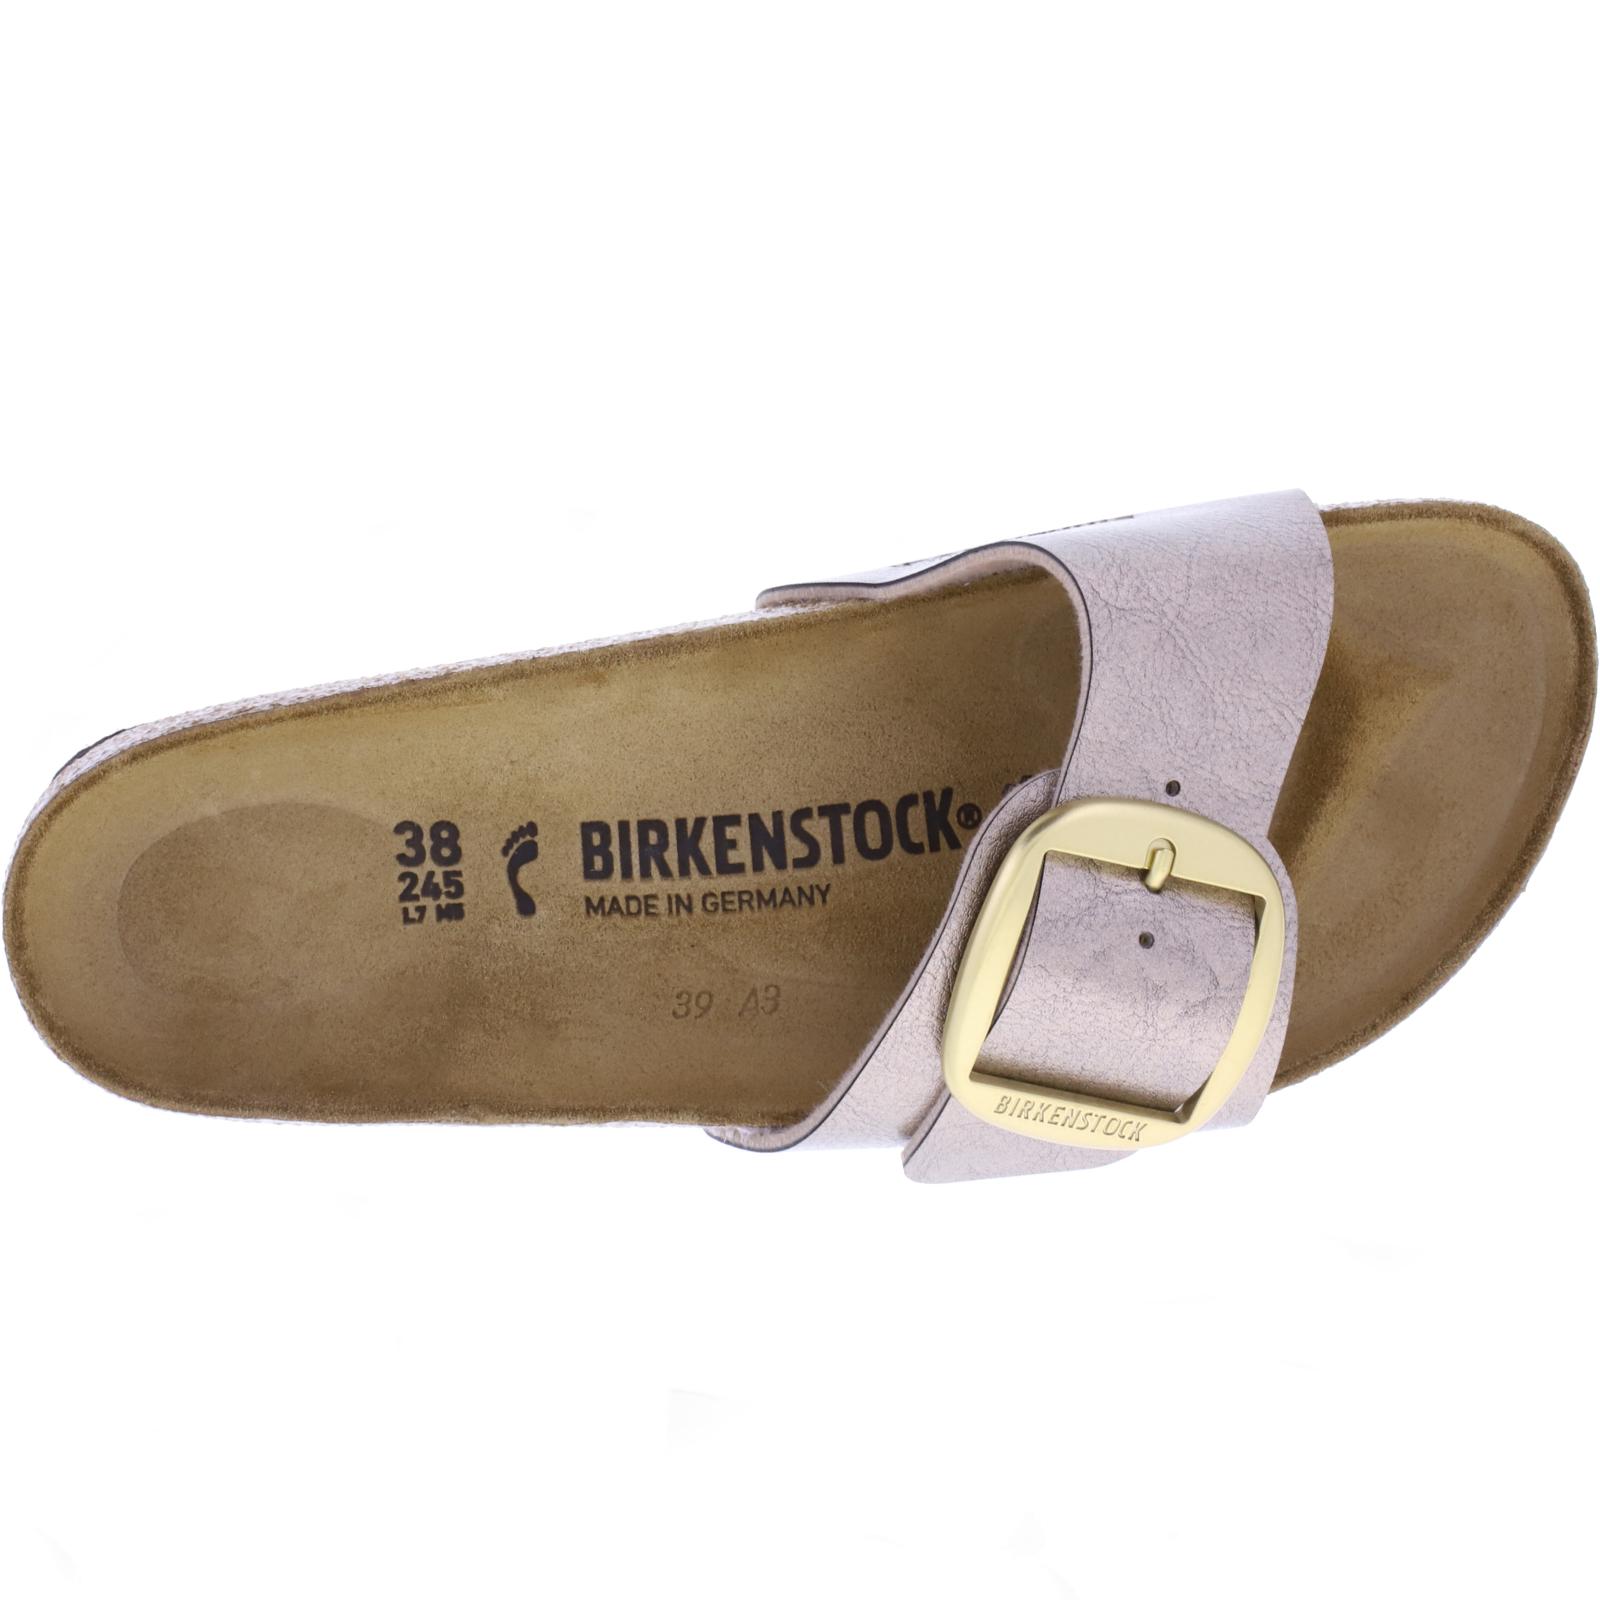 Birkenstock Modell: Madrid Big Buckle Graceful Taupe Weite: Schmal Art: 1016237 Sandalen